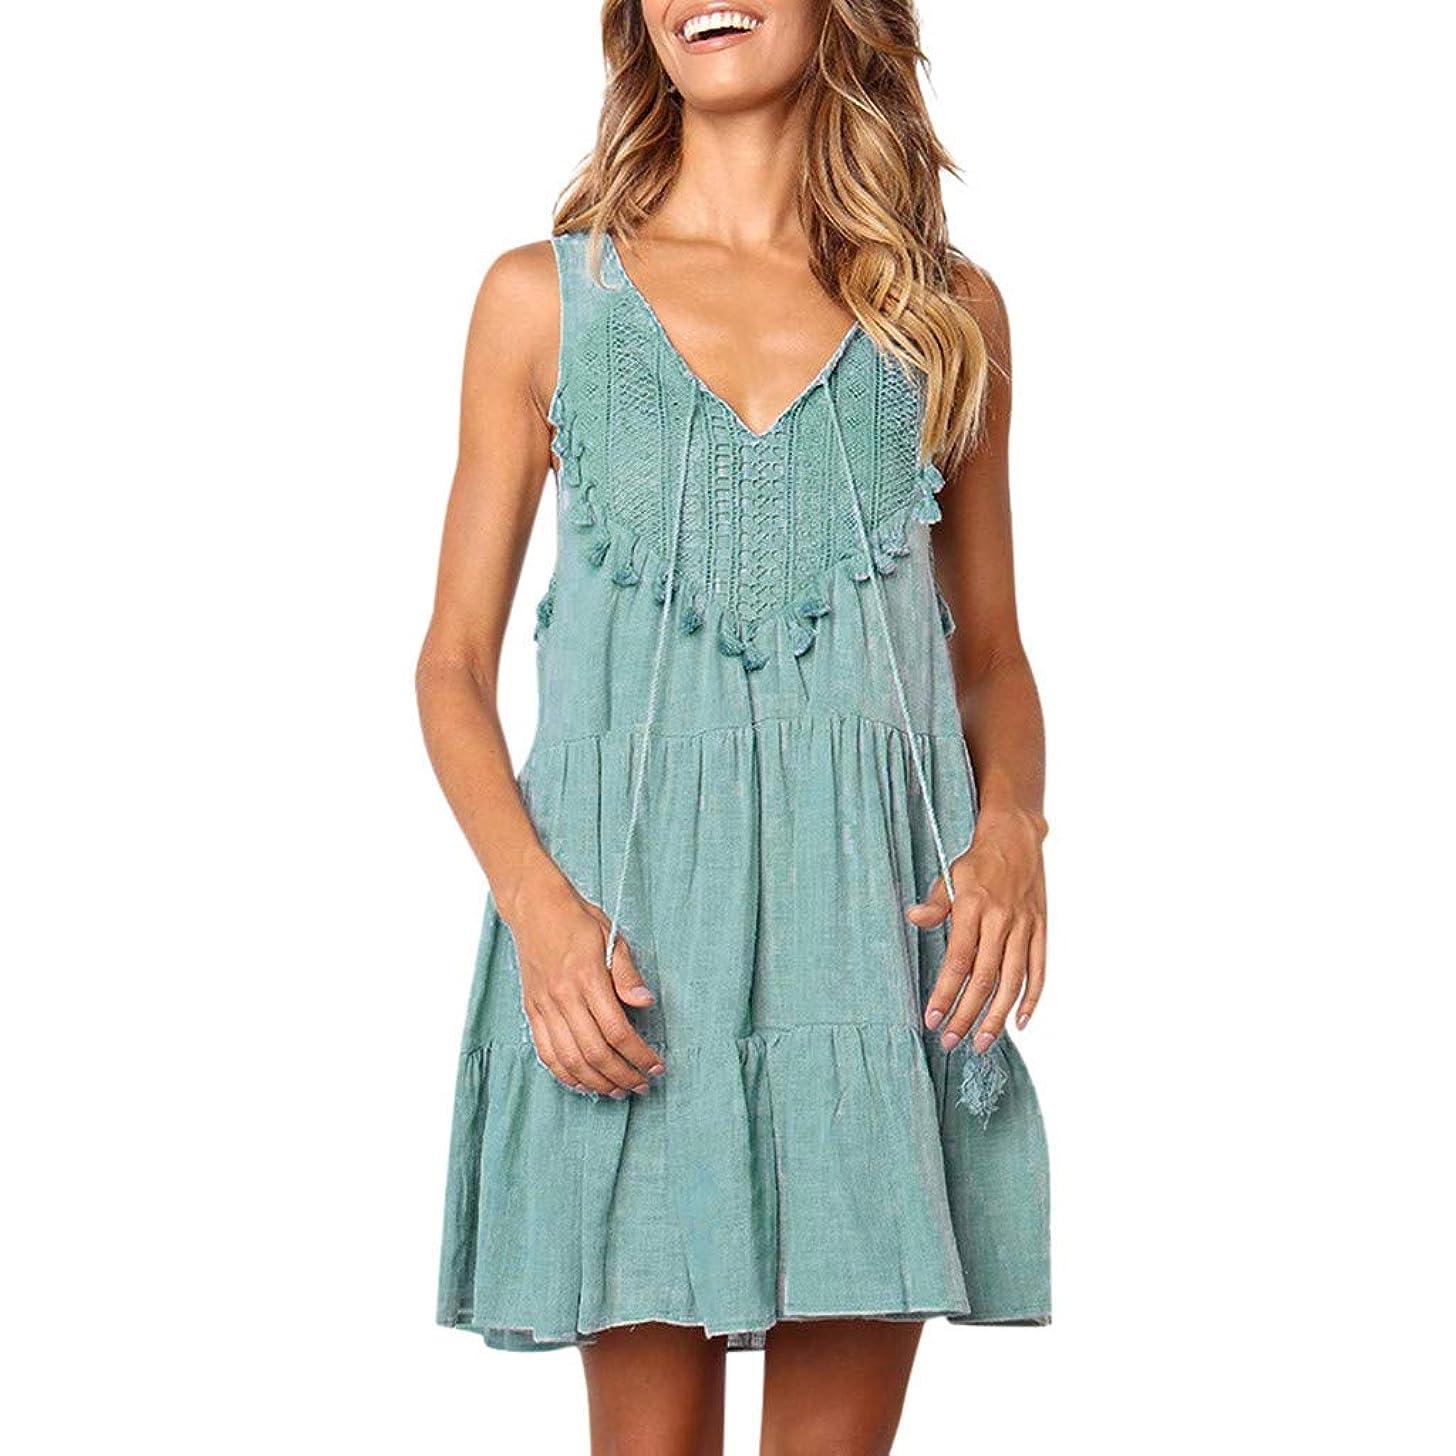 Women Lace Ruffle Mini Dress V Neck Sleeveless Strap Tassel Loose Casual Swing Flowy Pleated Solid Short Beach Sundress